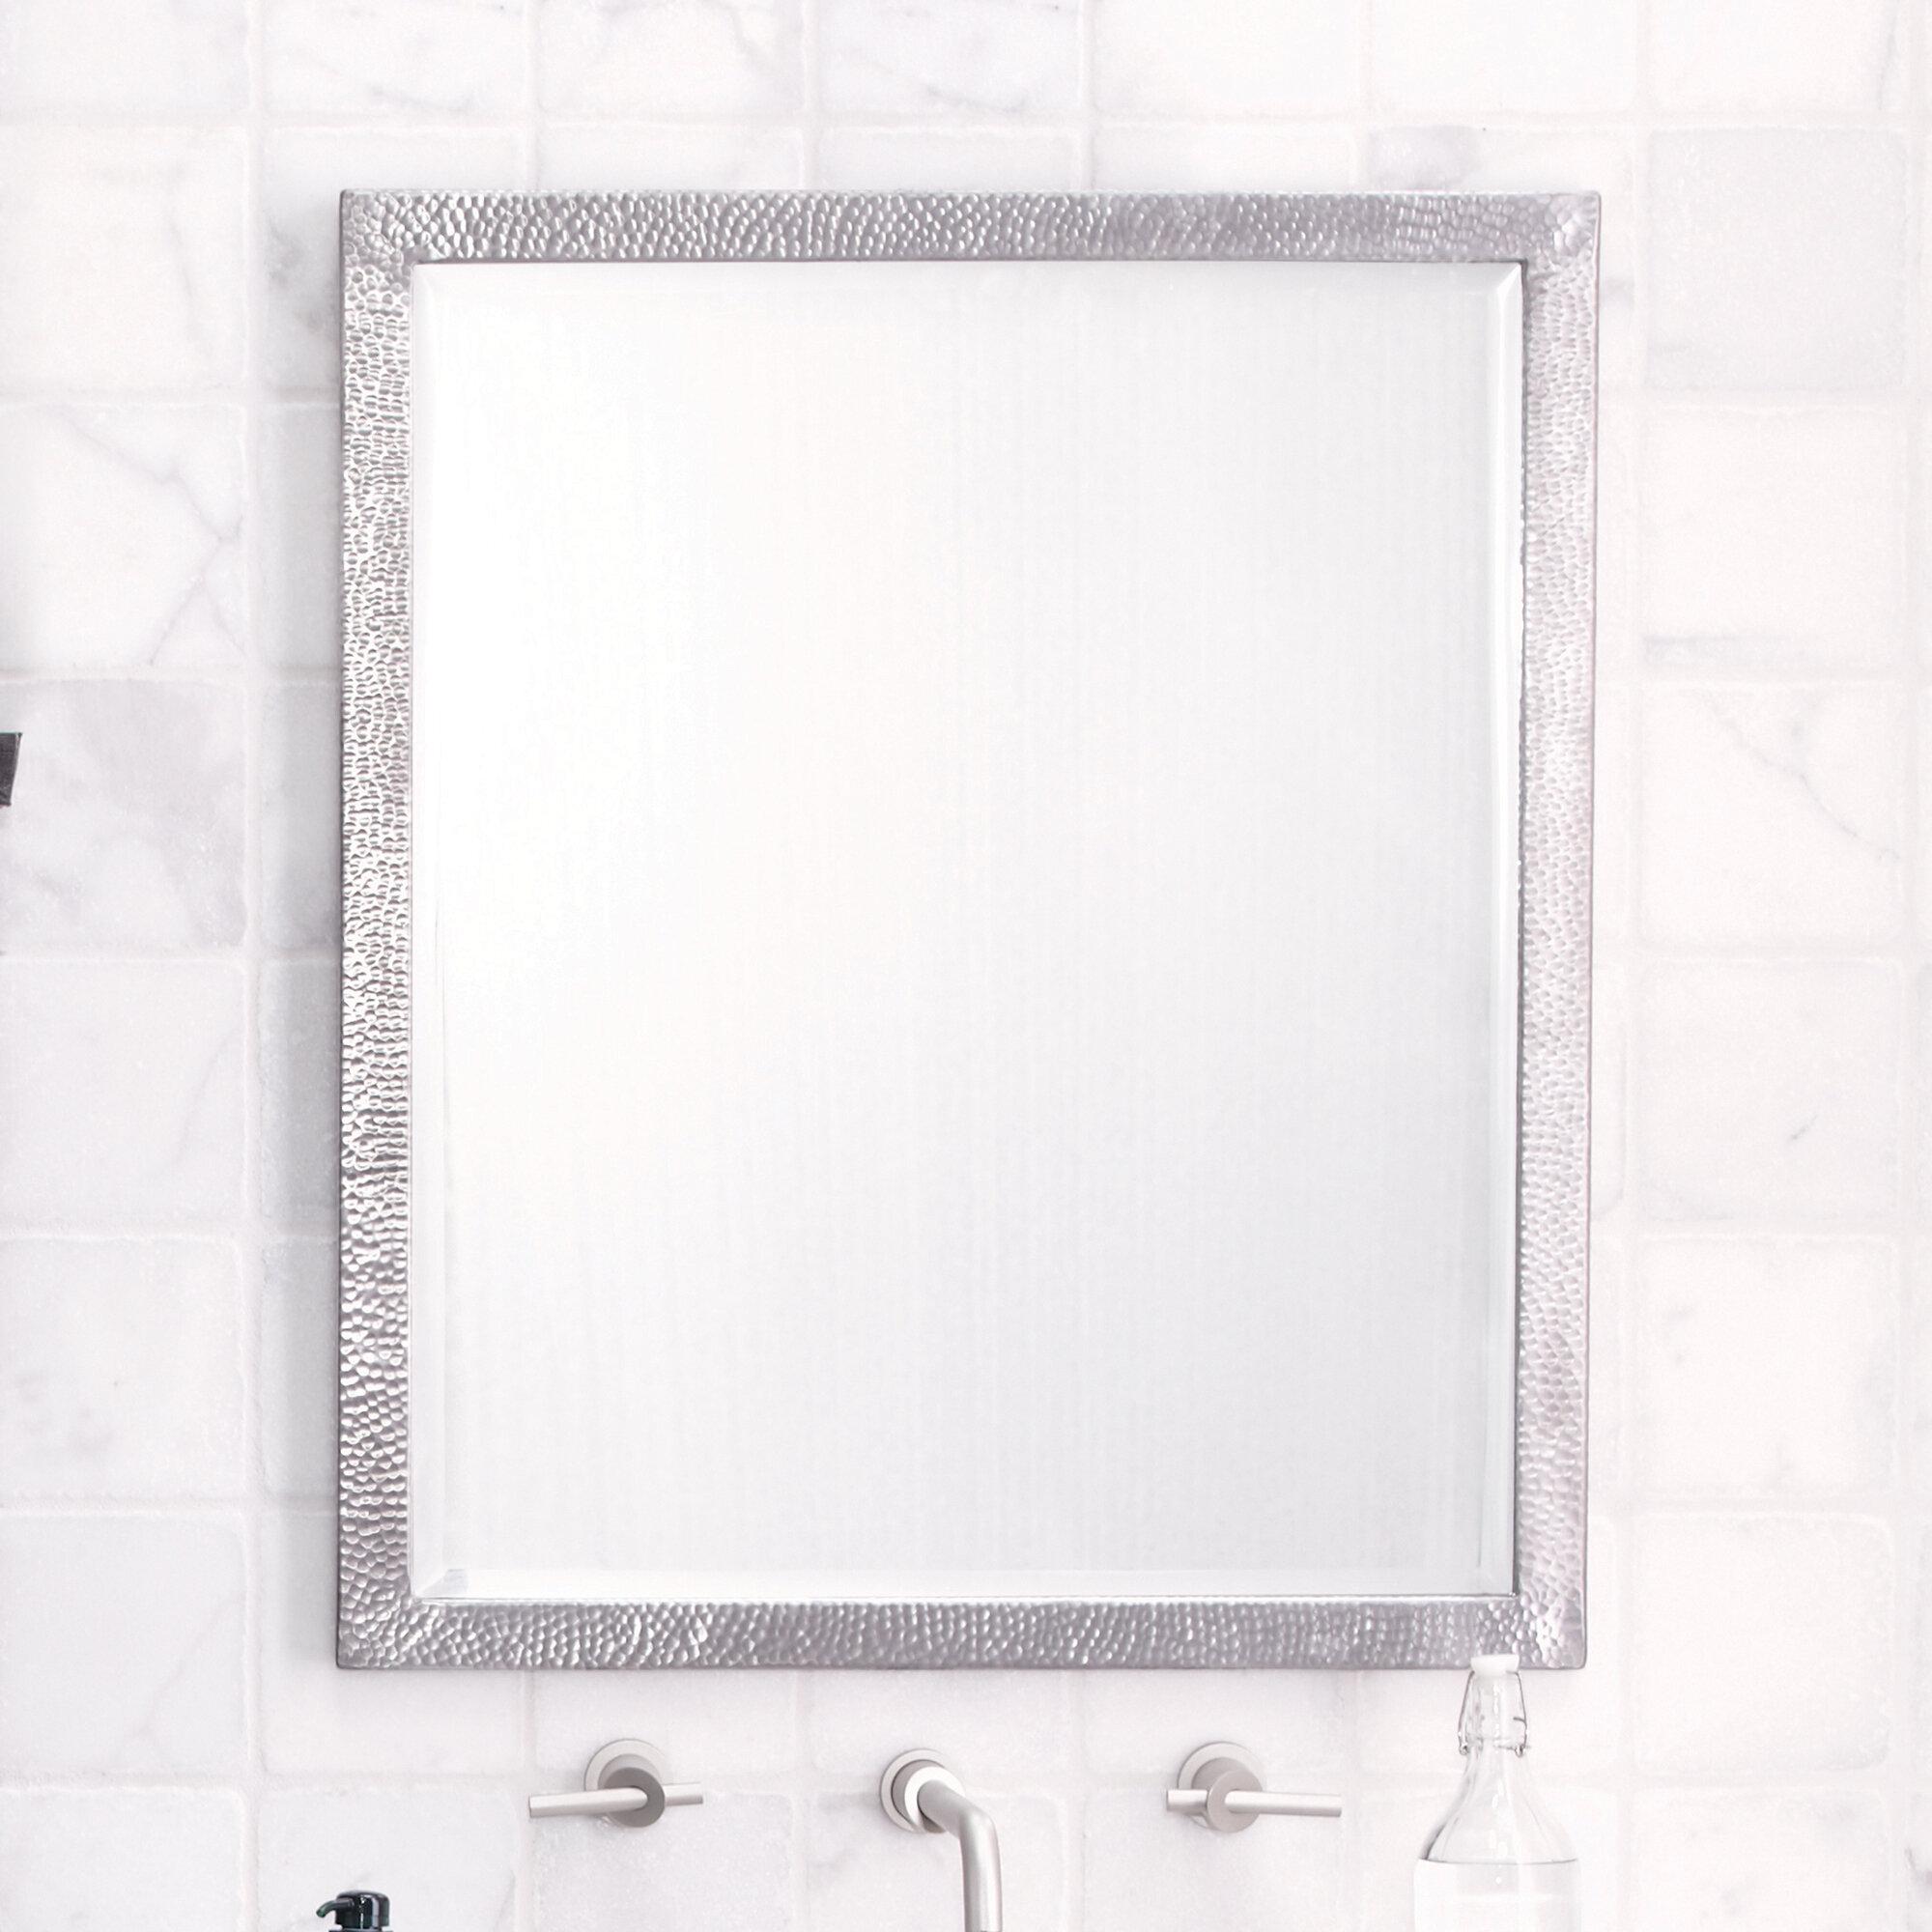 Native Trails Renewal Divinity Large Modern Contemporary Beveled Bathroom Vanity Mirror Reviews Wayfair